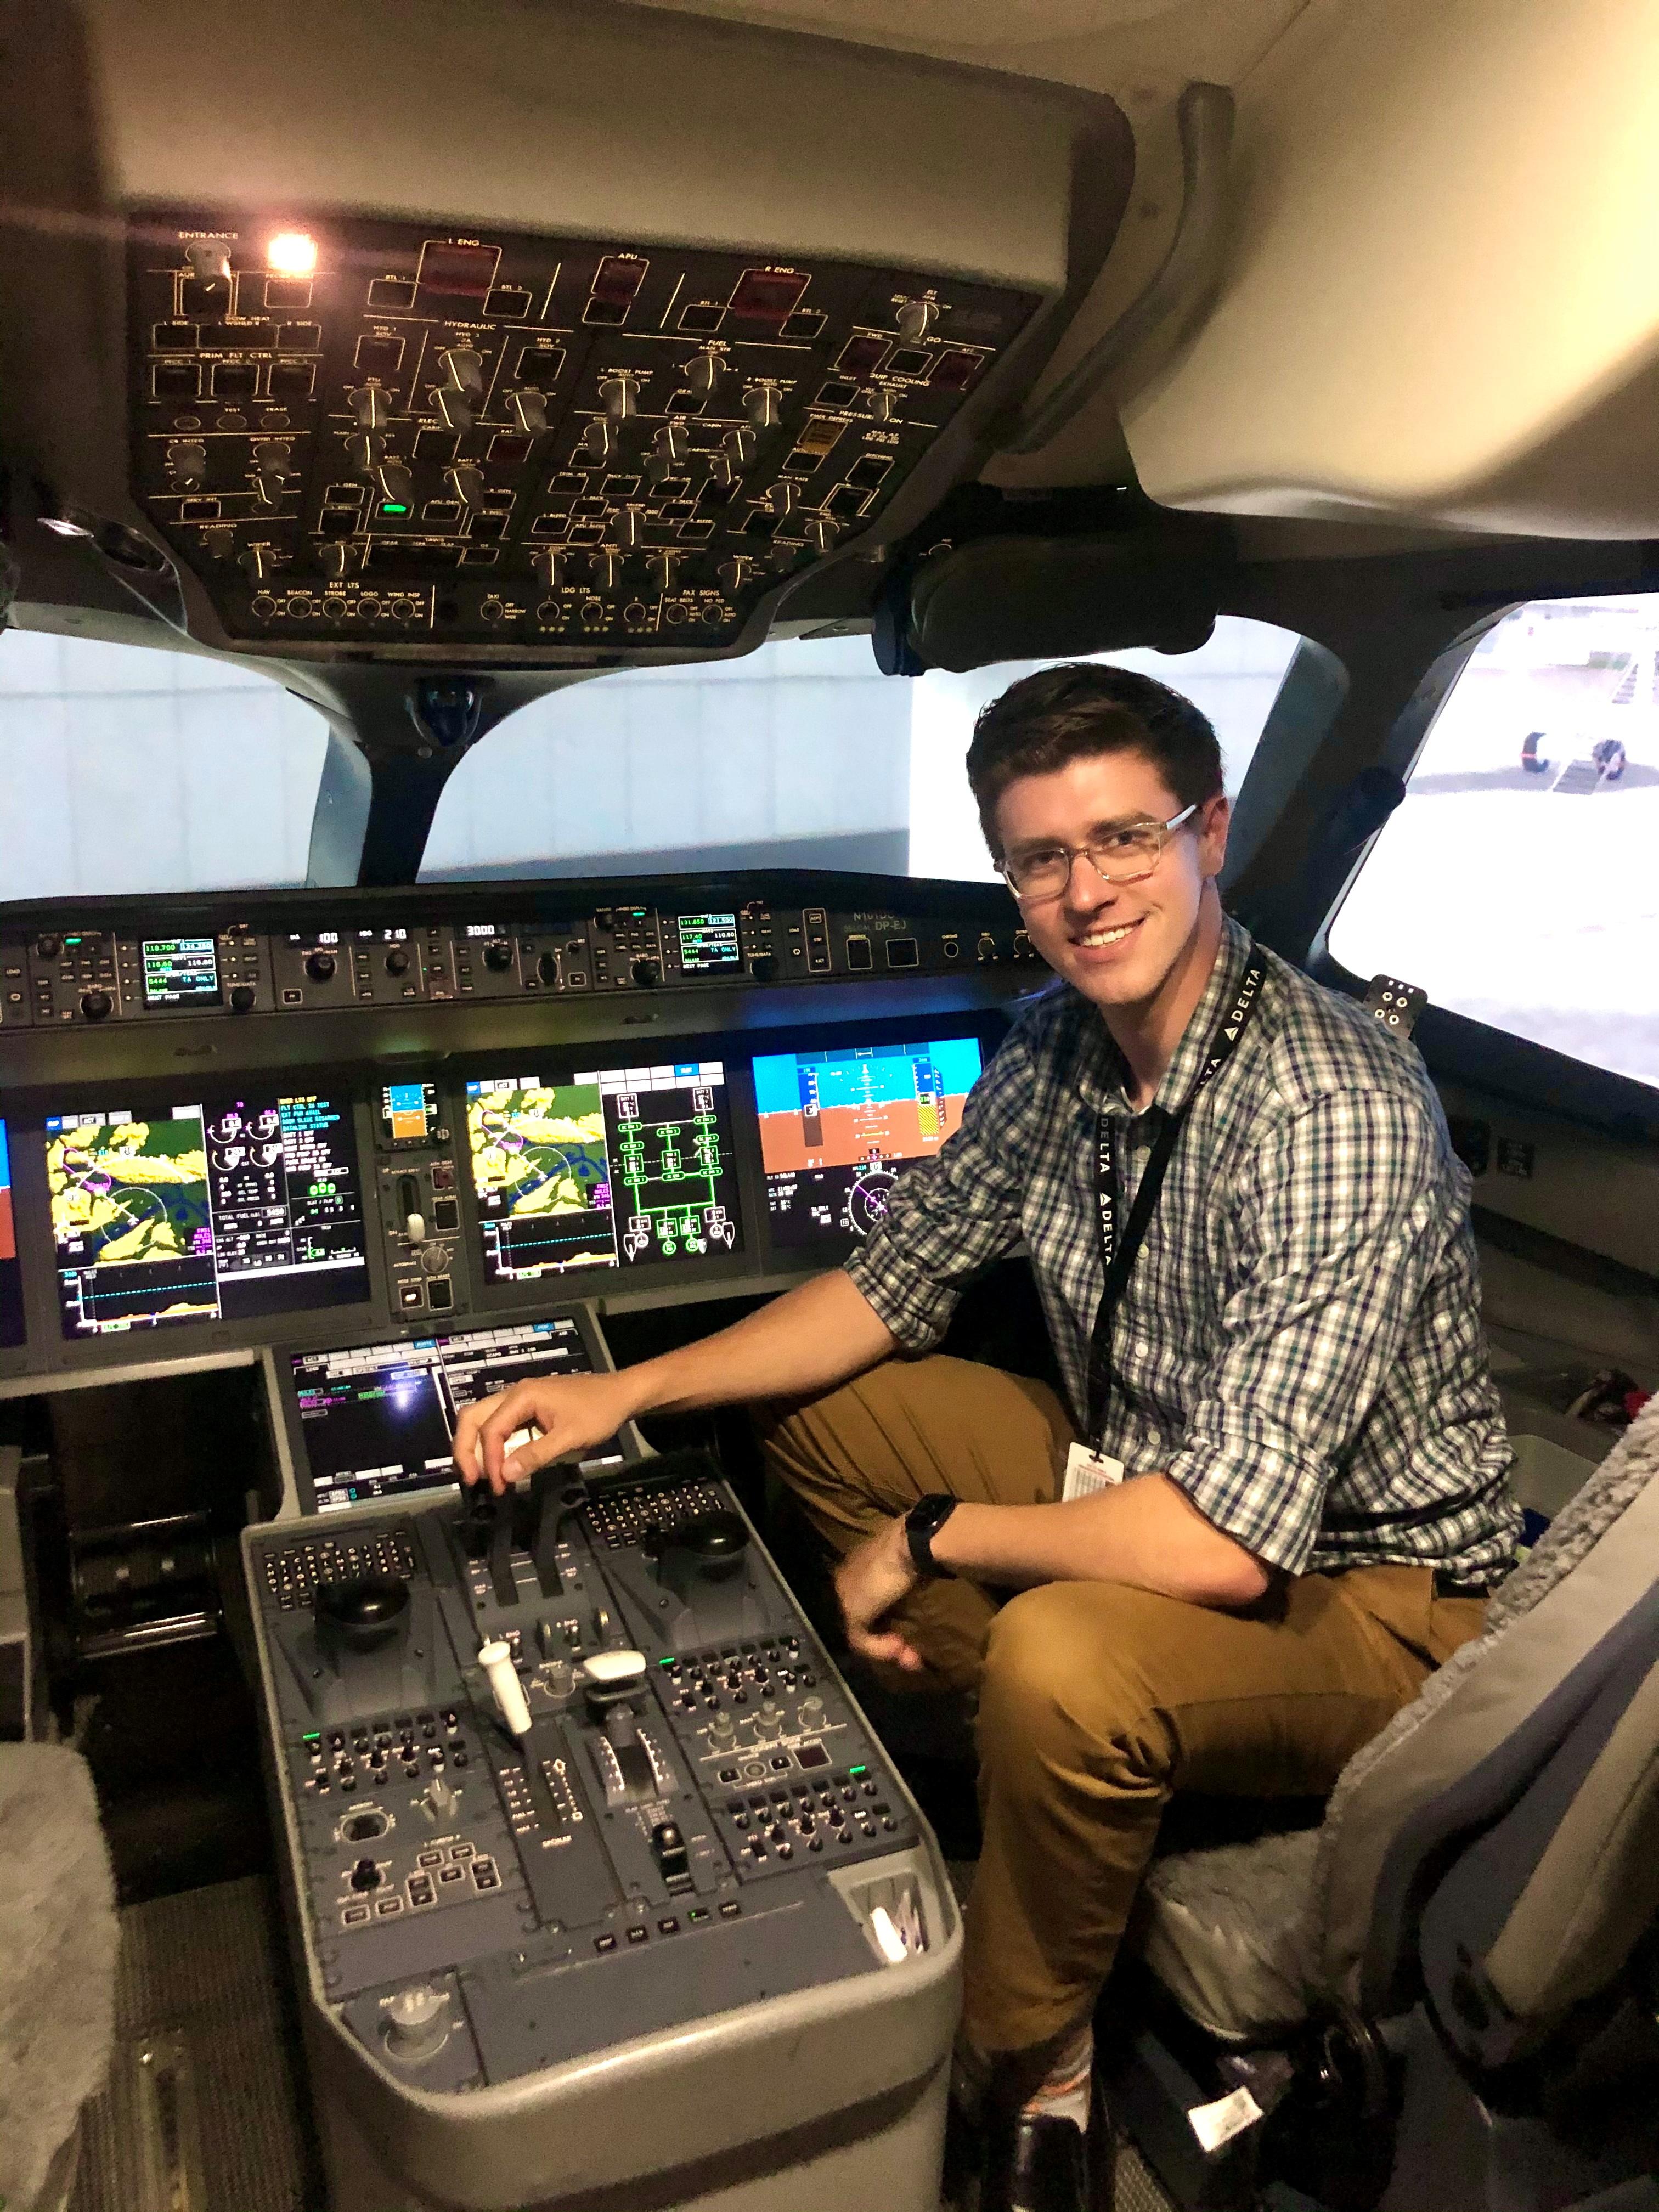 Delta Air Lines pilot Ben Wallander sits in an Airbus A220 simulator in Atlanta, Georgia, U.S., May 30, 2020. Picture taken May 30, 2020. Ben Wallander/Handout via REUTERS